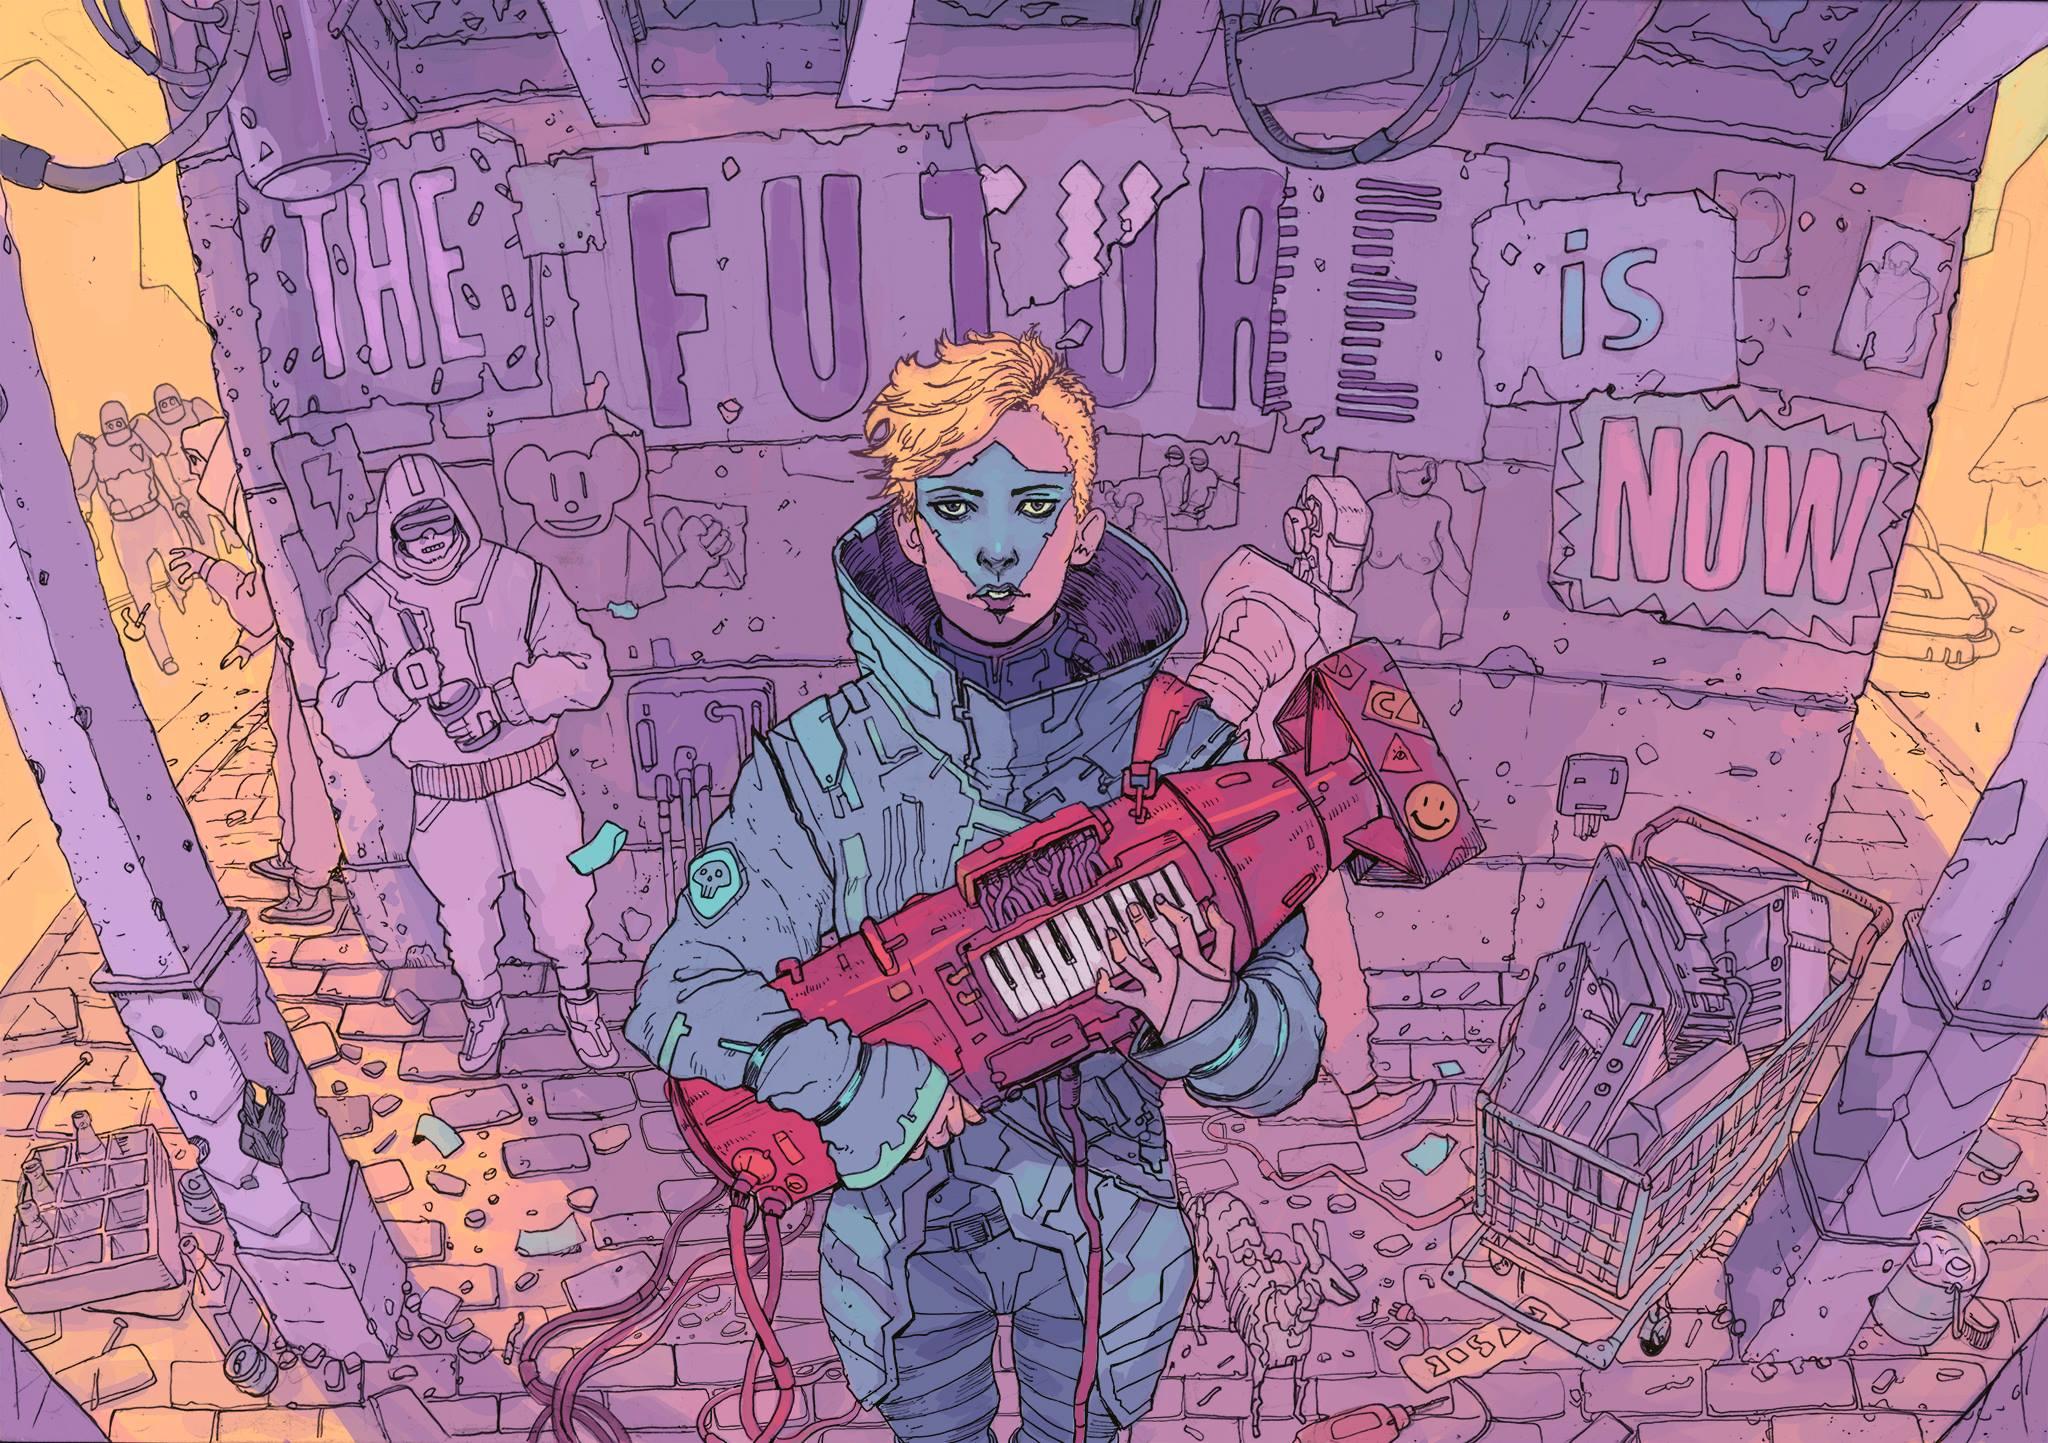 SCI Fi Cyberpunk Ilustração 08 - Josan Gonzalez